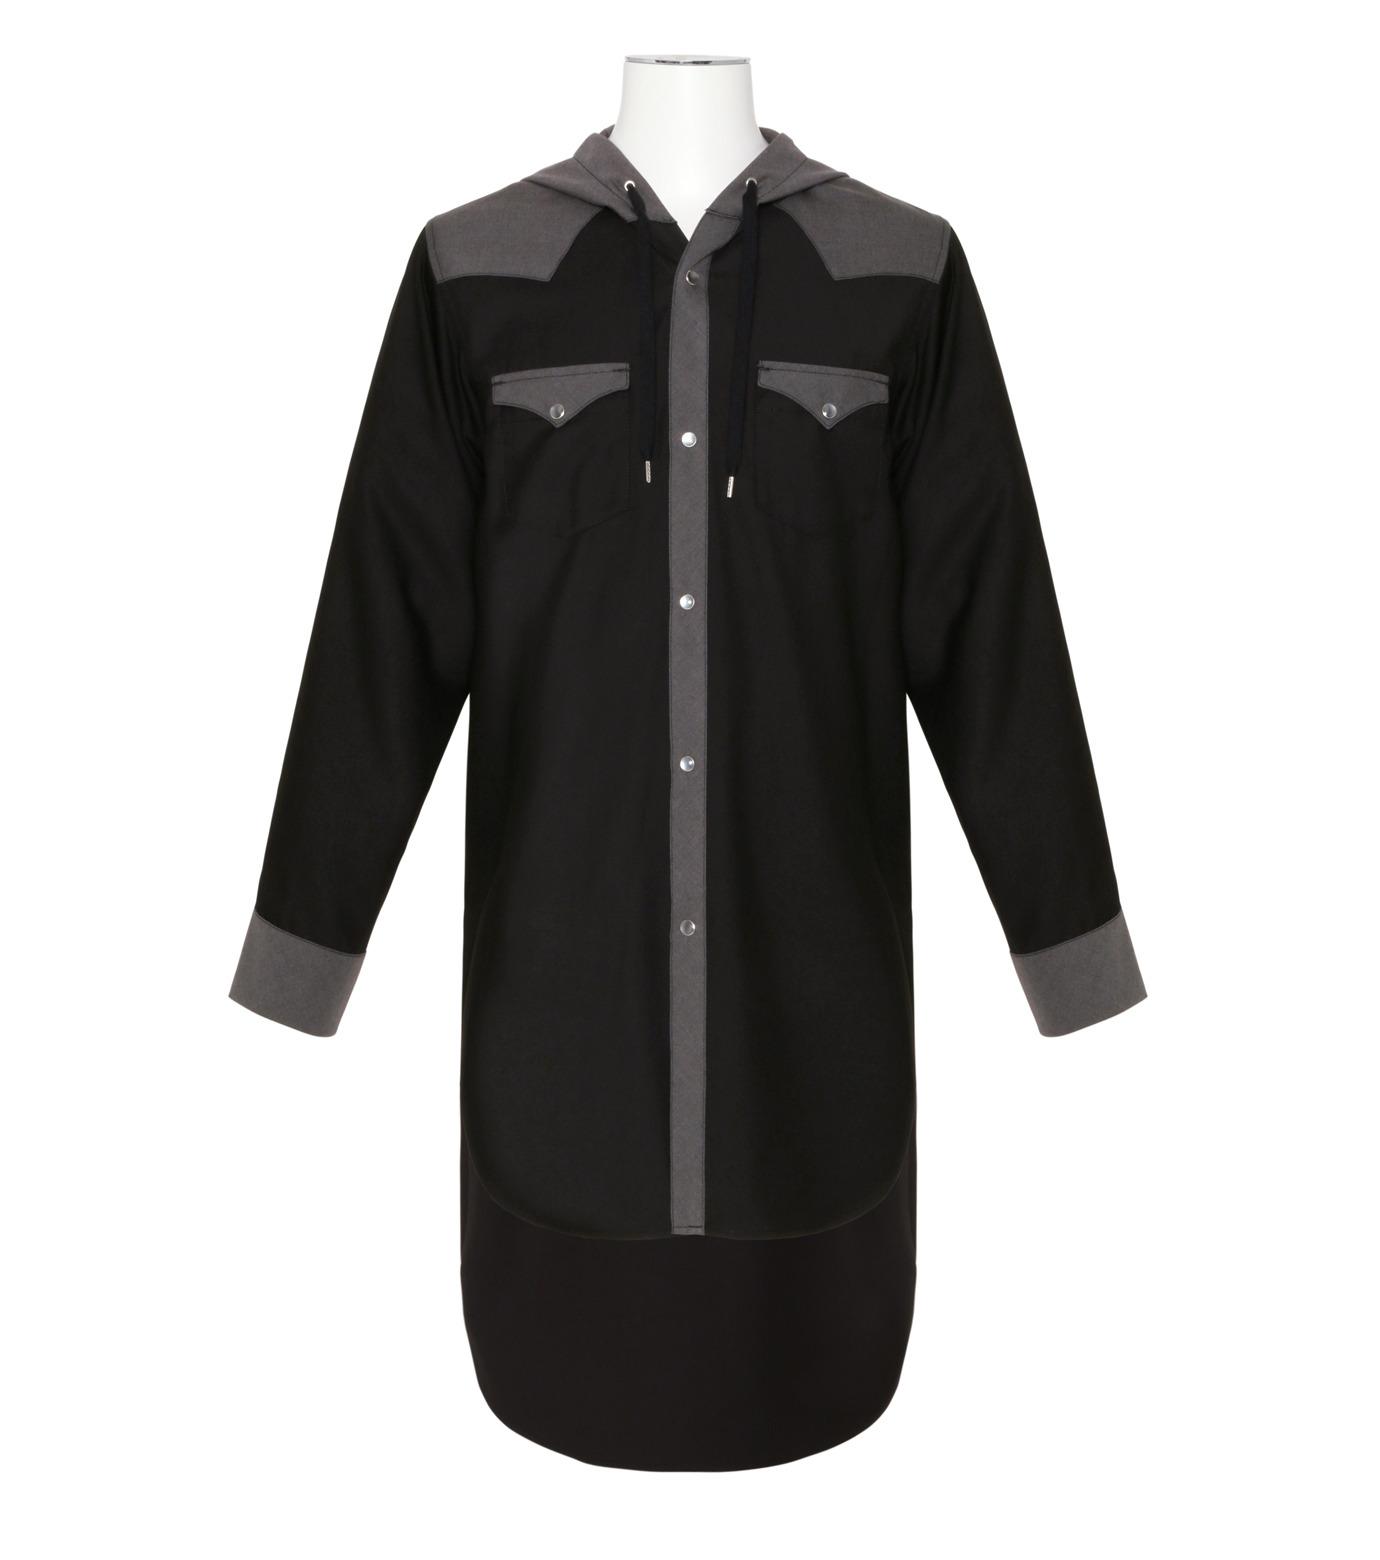 KIDILL(キディル)のWestern Hooded Shirt-BLACK(シャツ/shirt)-KL160-13 拡大詳細画像1